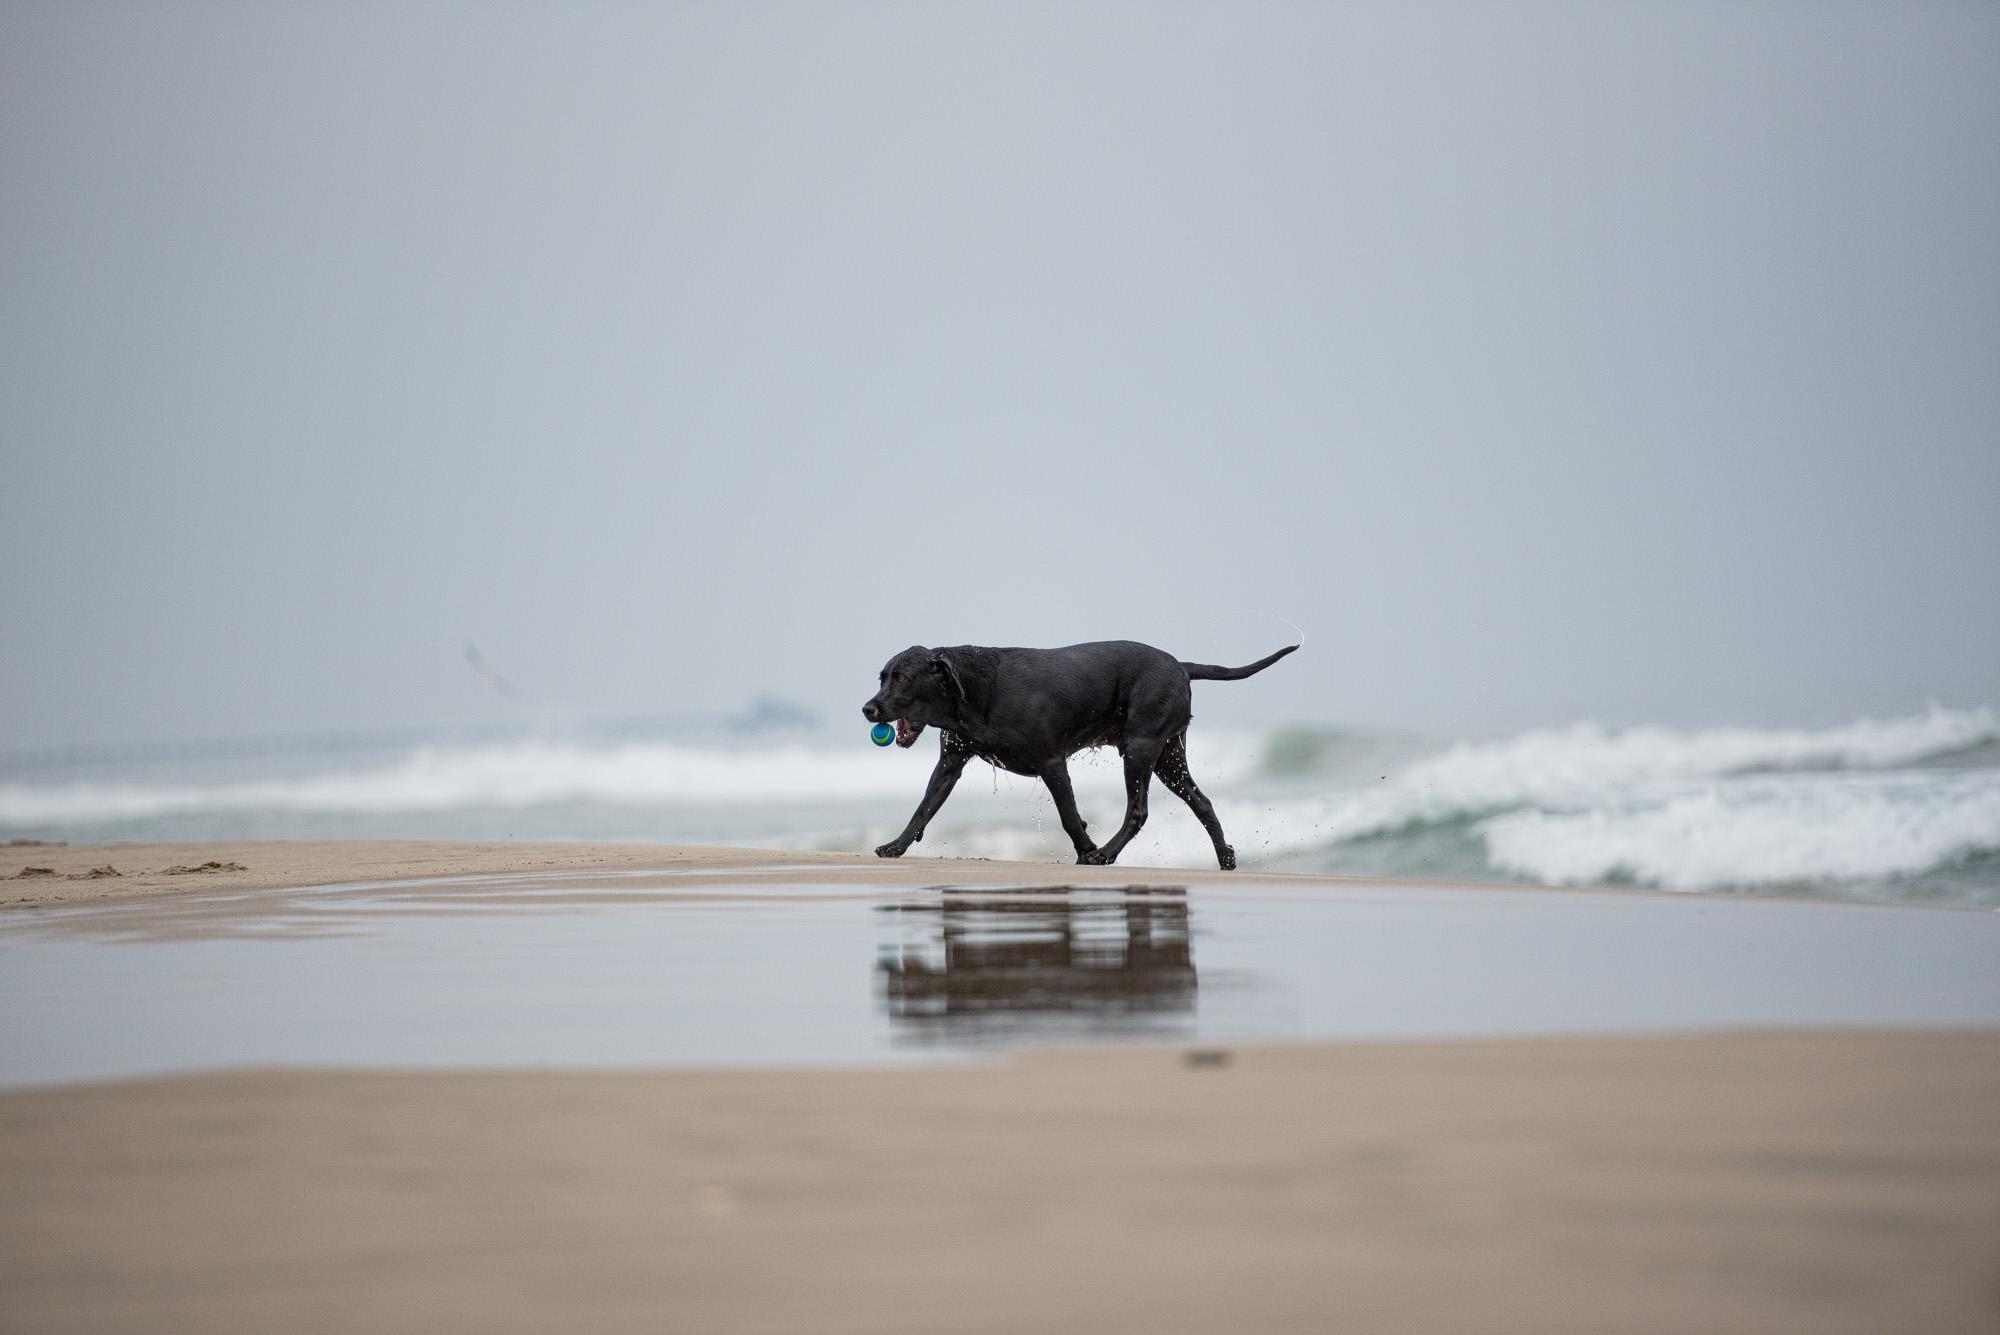 Newport Beach Dog Beach photo.JPG